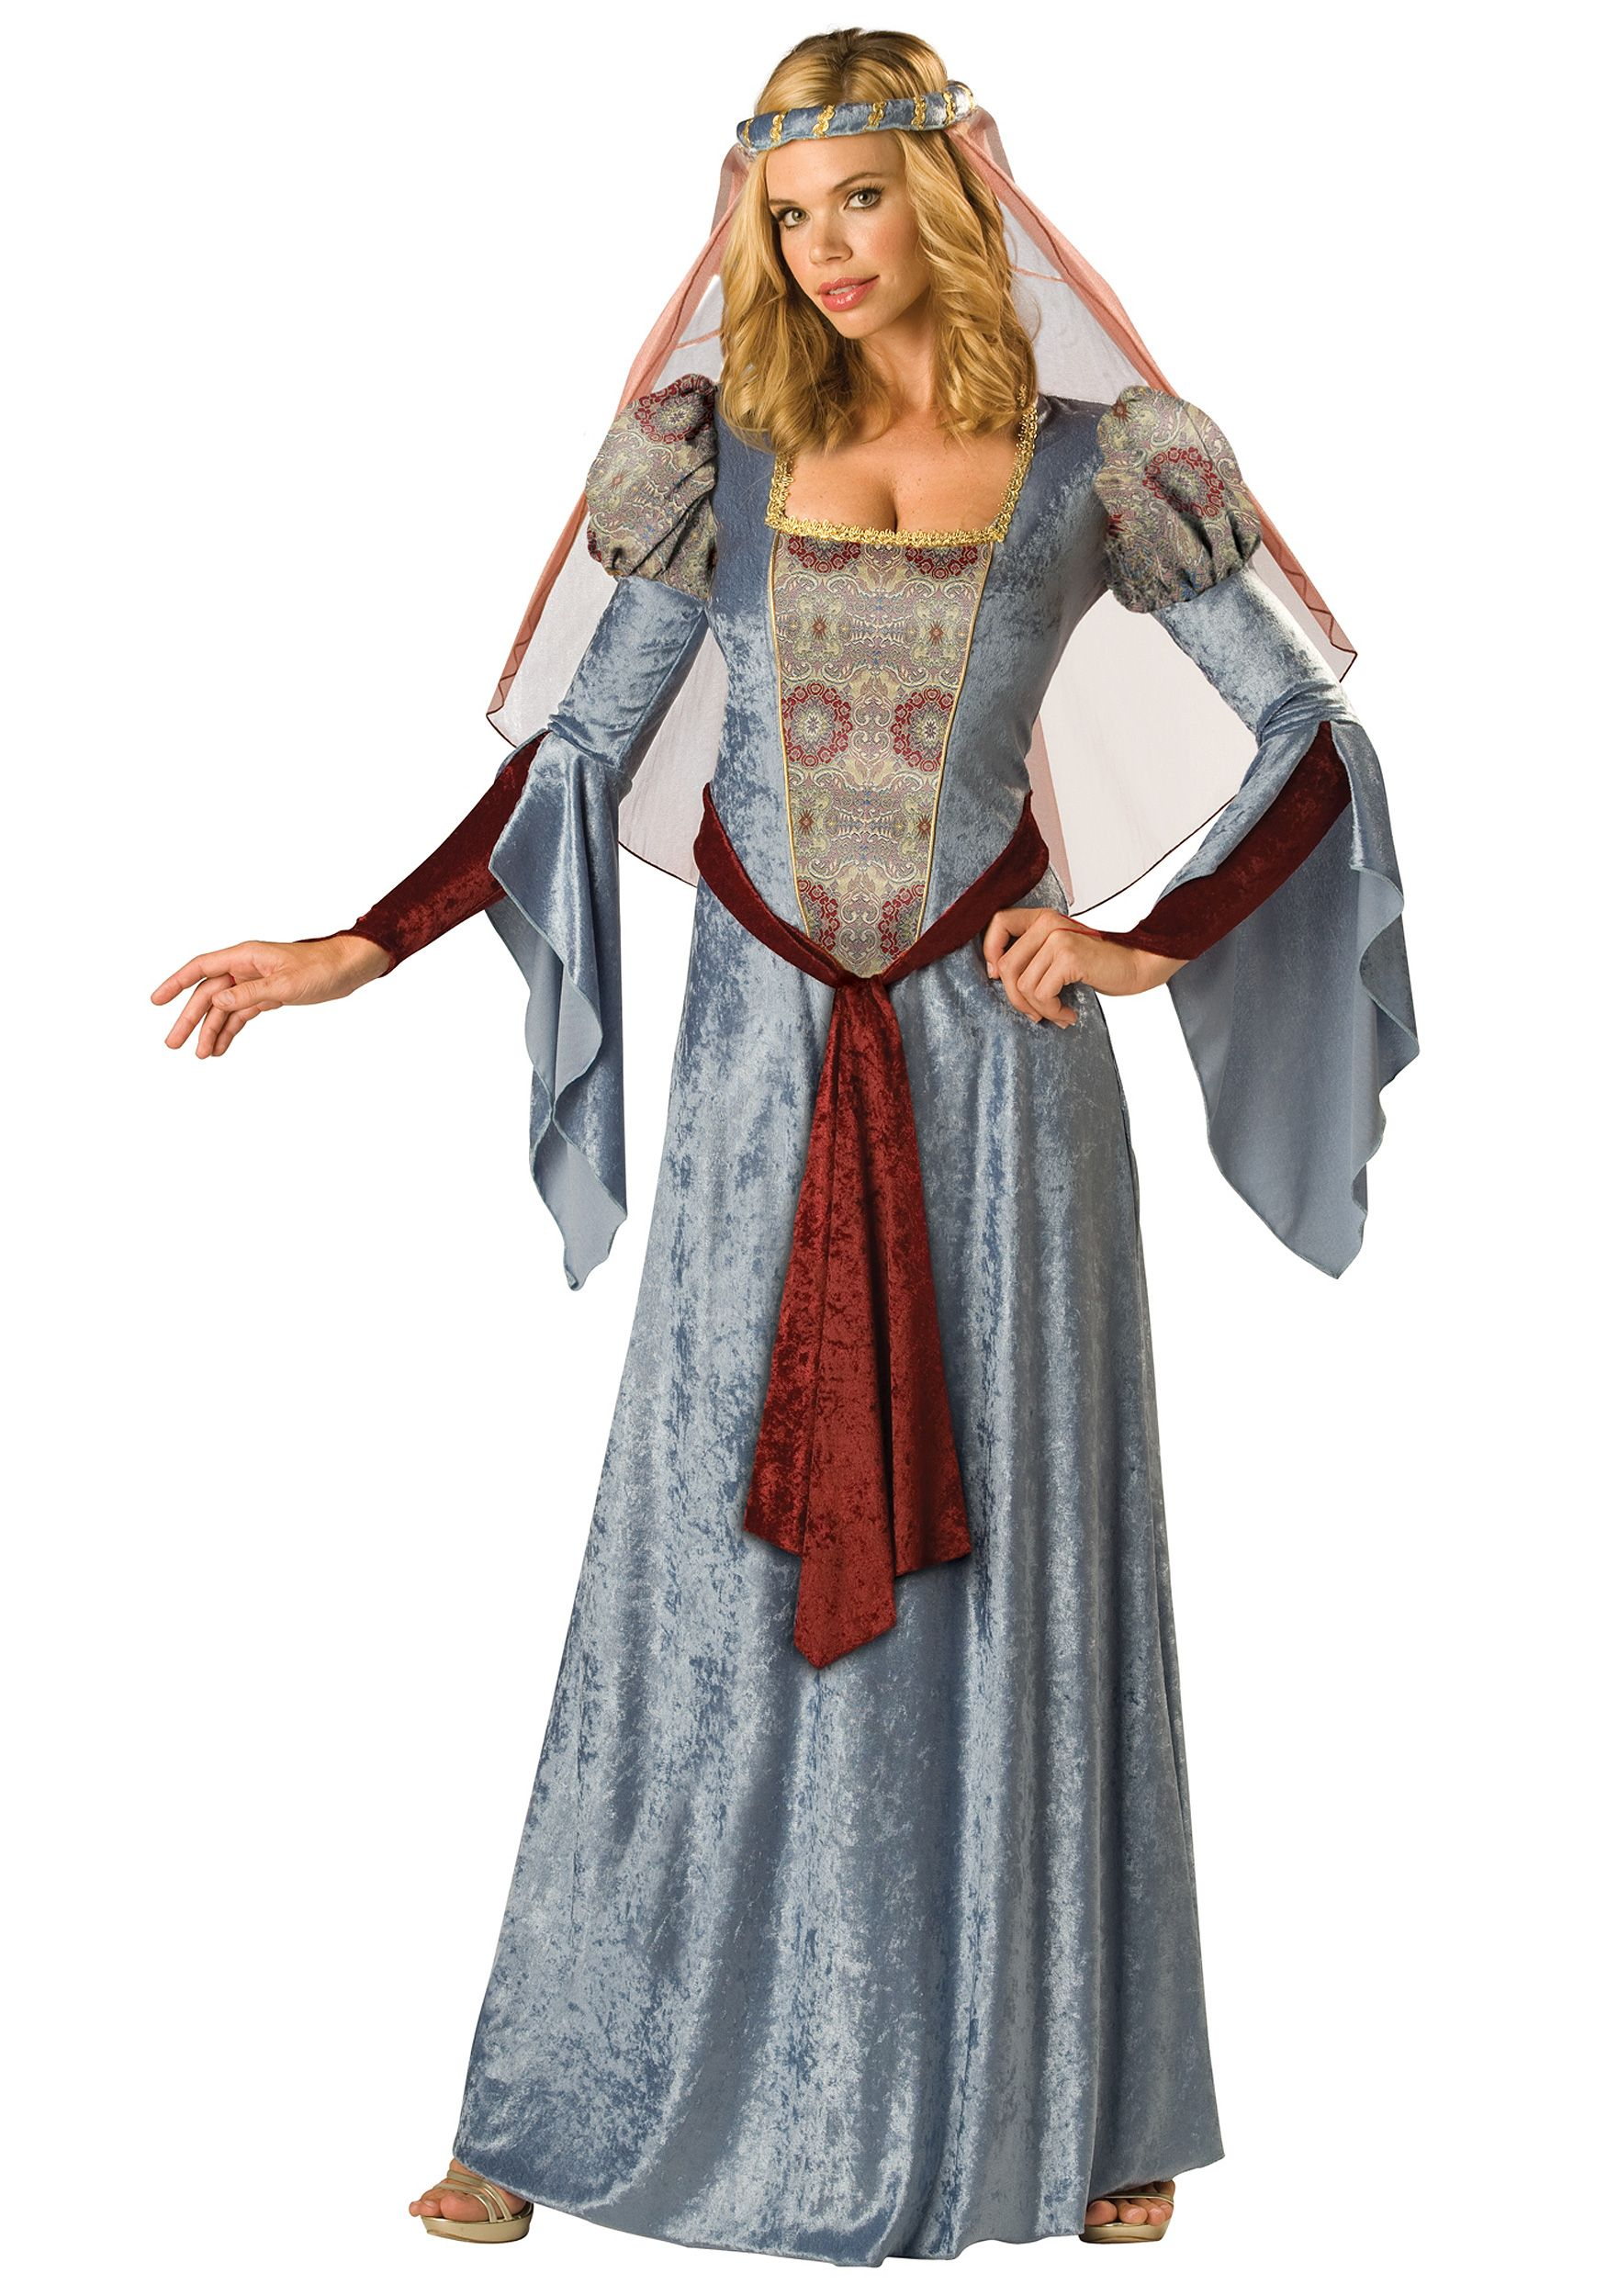 Ladies Maid Marion Costume Adults Fair Maiden Fancy Dress Princess Robin Hood